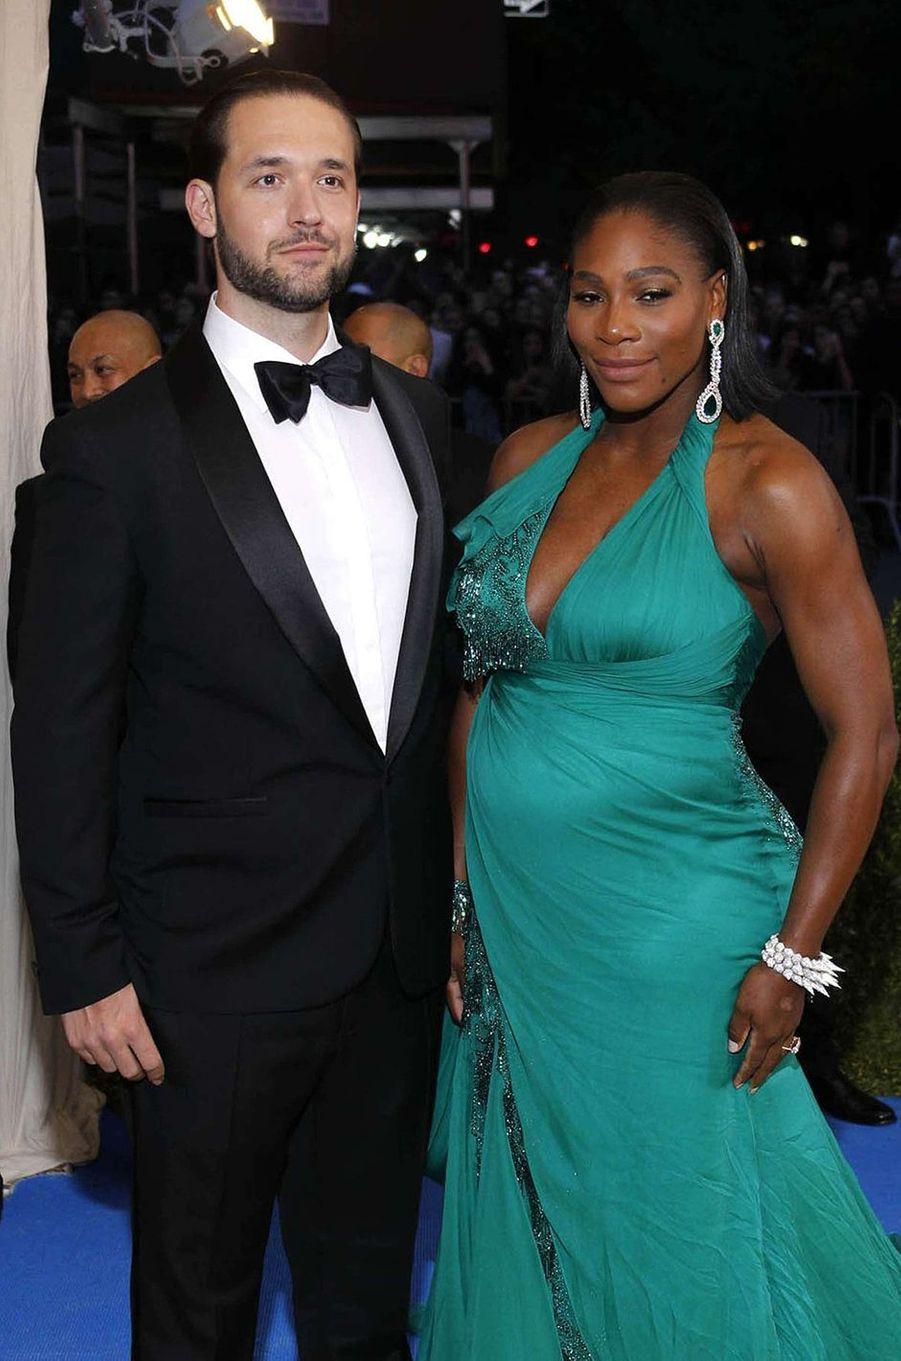 Serena Williams et Alexis Ohanian au Met Gala à New York, le 1er mai 2017.